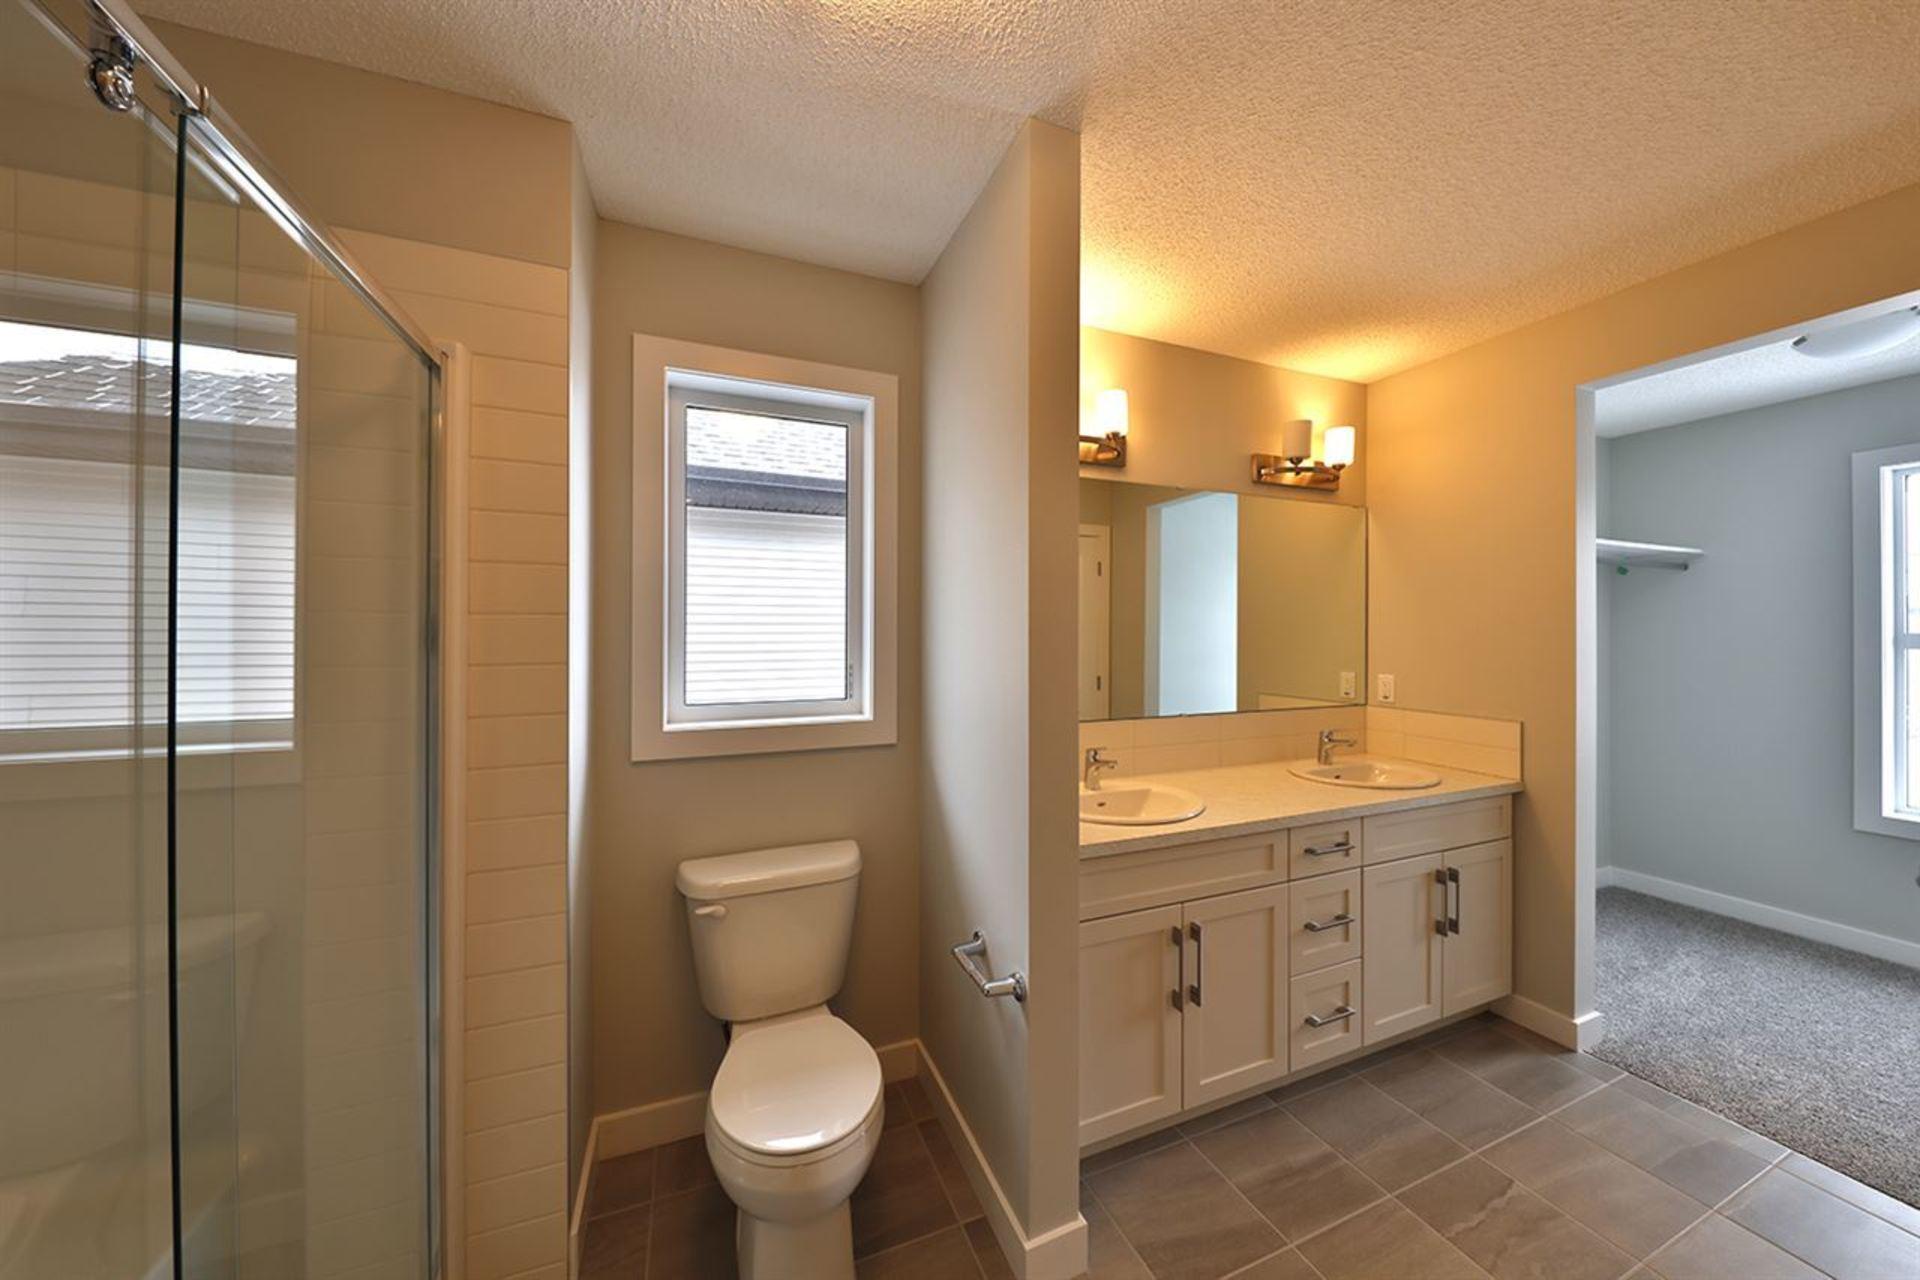 17550-60a-street-mcconachie-area-edmonton-17 at 17550 60a Street, McConachie Area, Edmonton